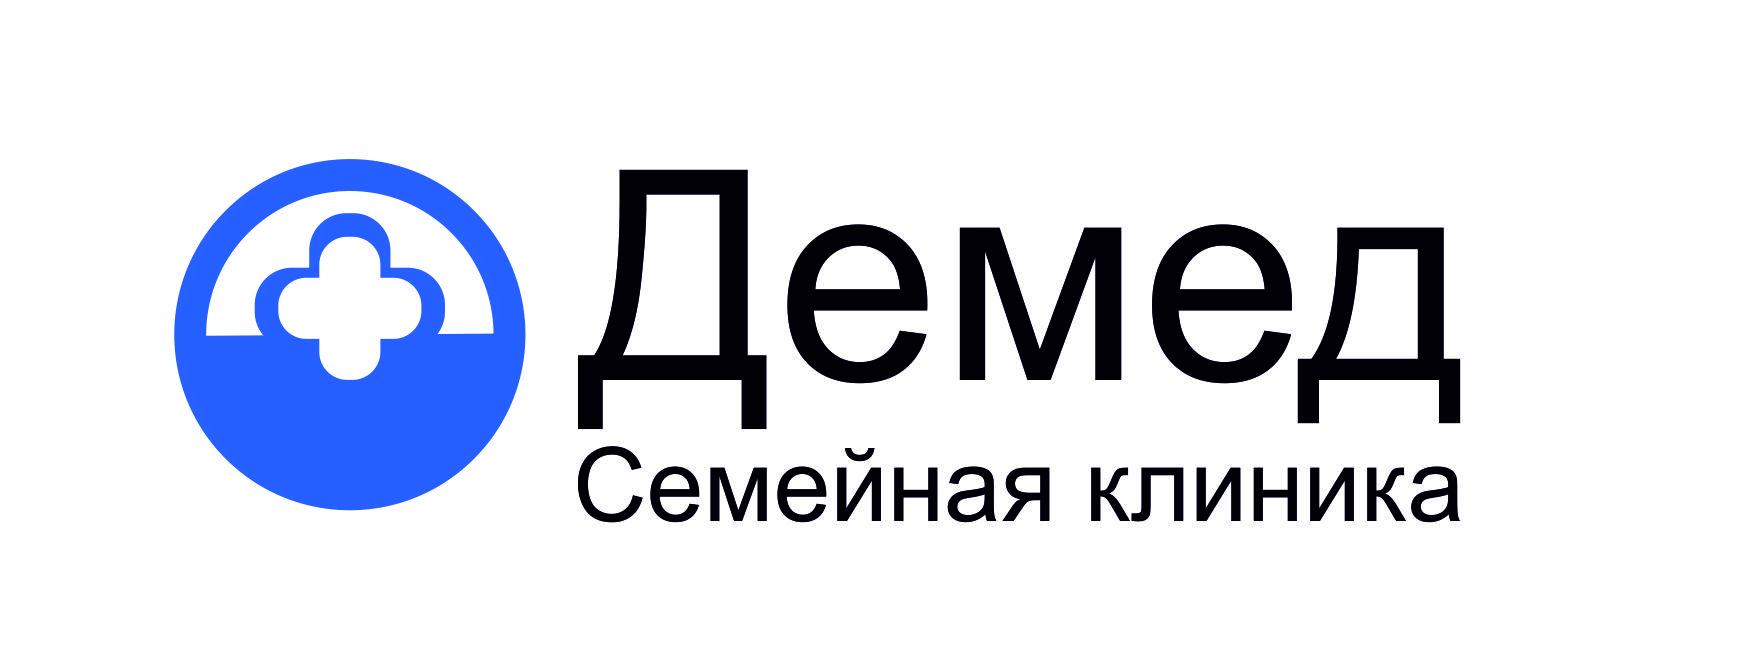 Логотип медицинского центра фото f_6275dcdac3c13a8d.jpg